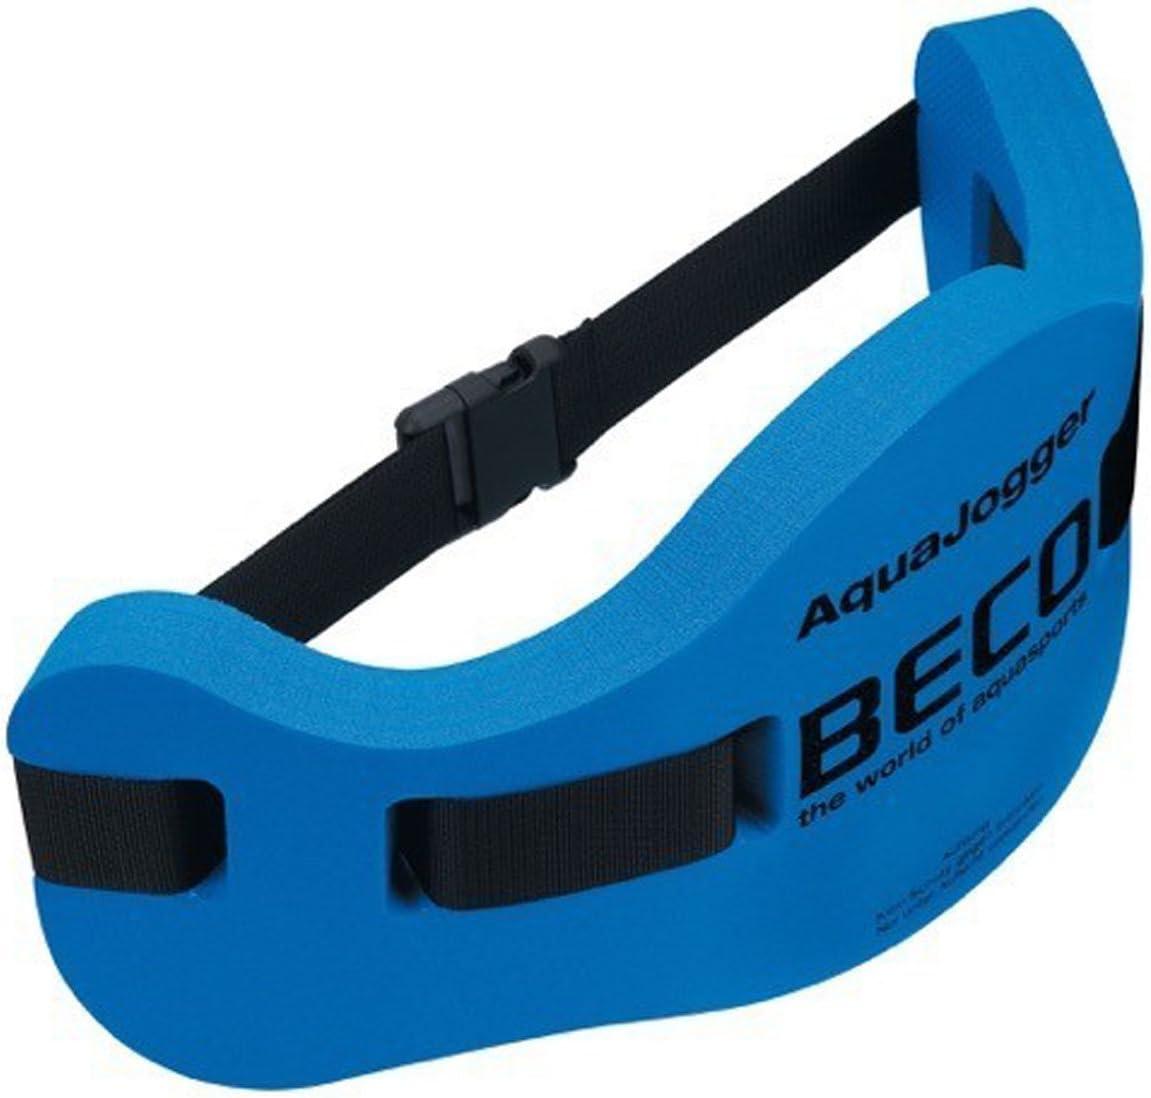 beco Aqua Jogging Pe Foam Pool Long Beach Mall Swimming Runner Belt Buoyancy Blu Max 51% OFF